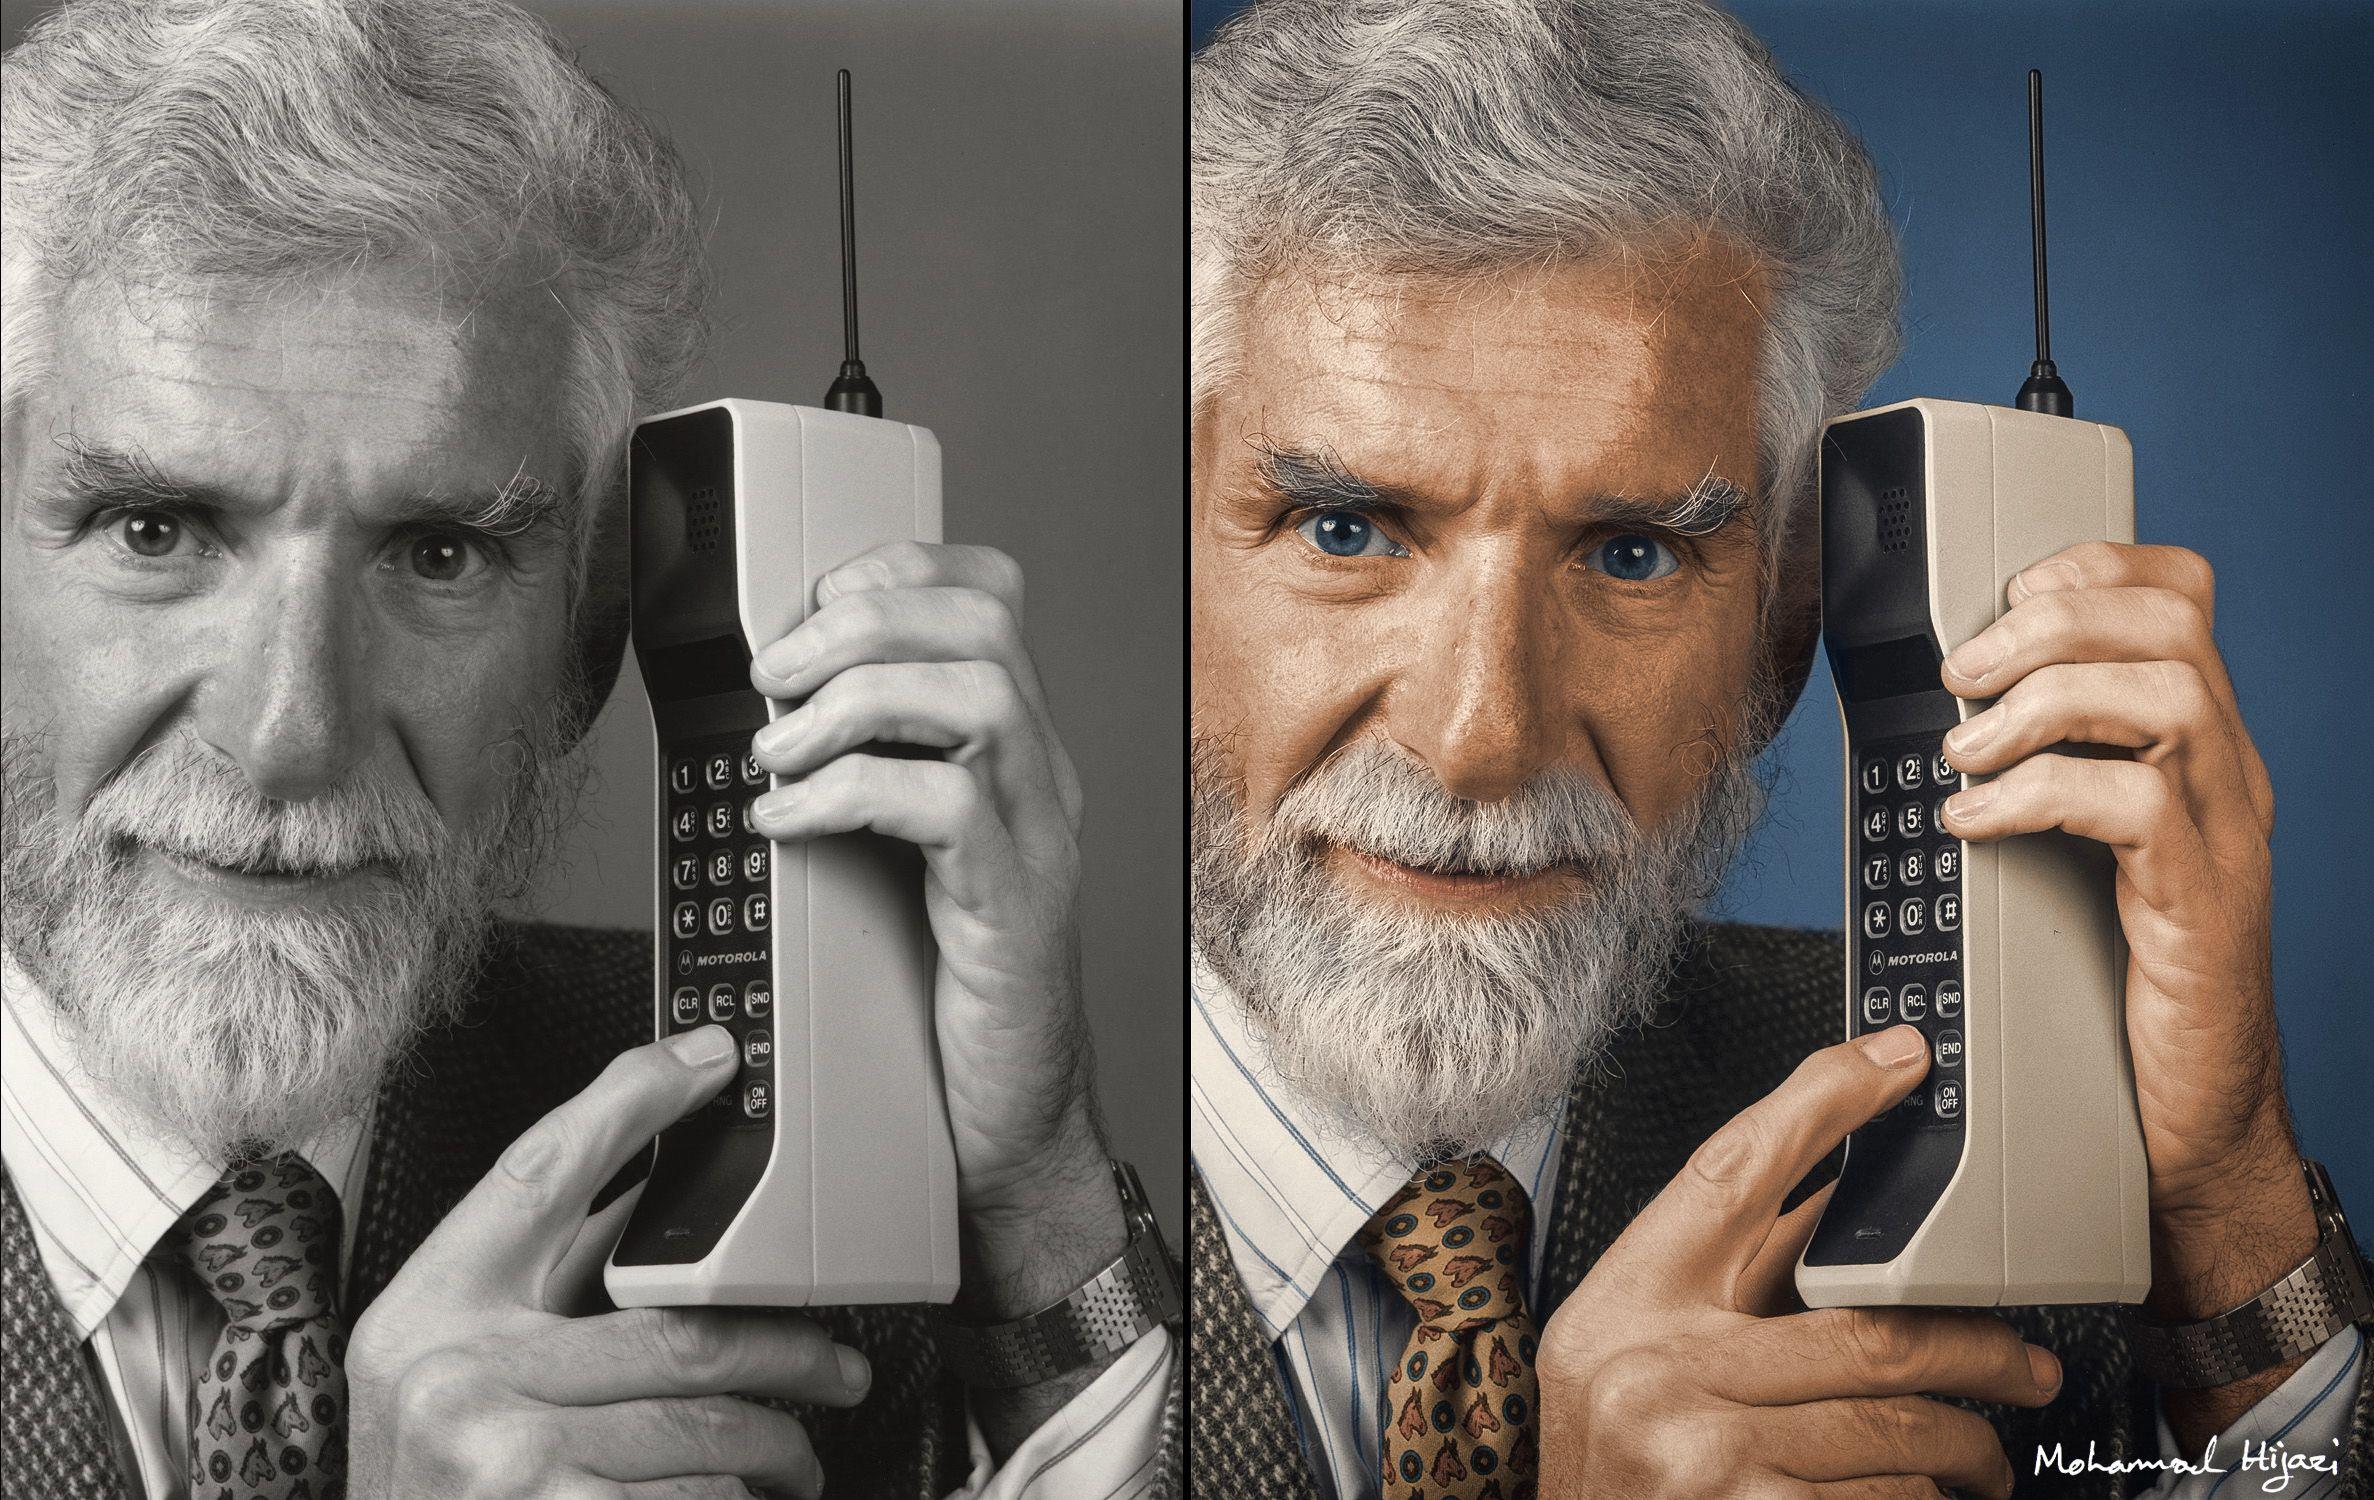 زد معلوماتك من مخترع الهاتف Phone Landline Phone Pay Phone